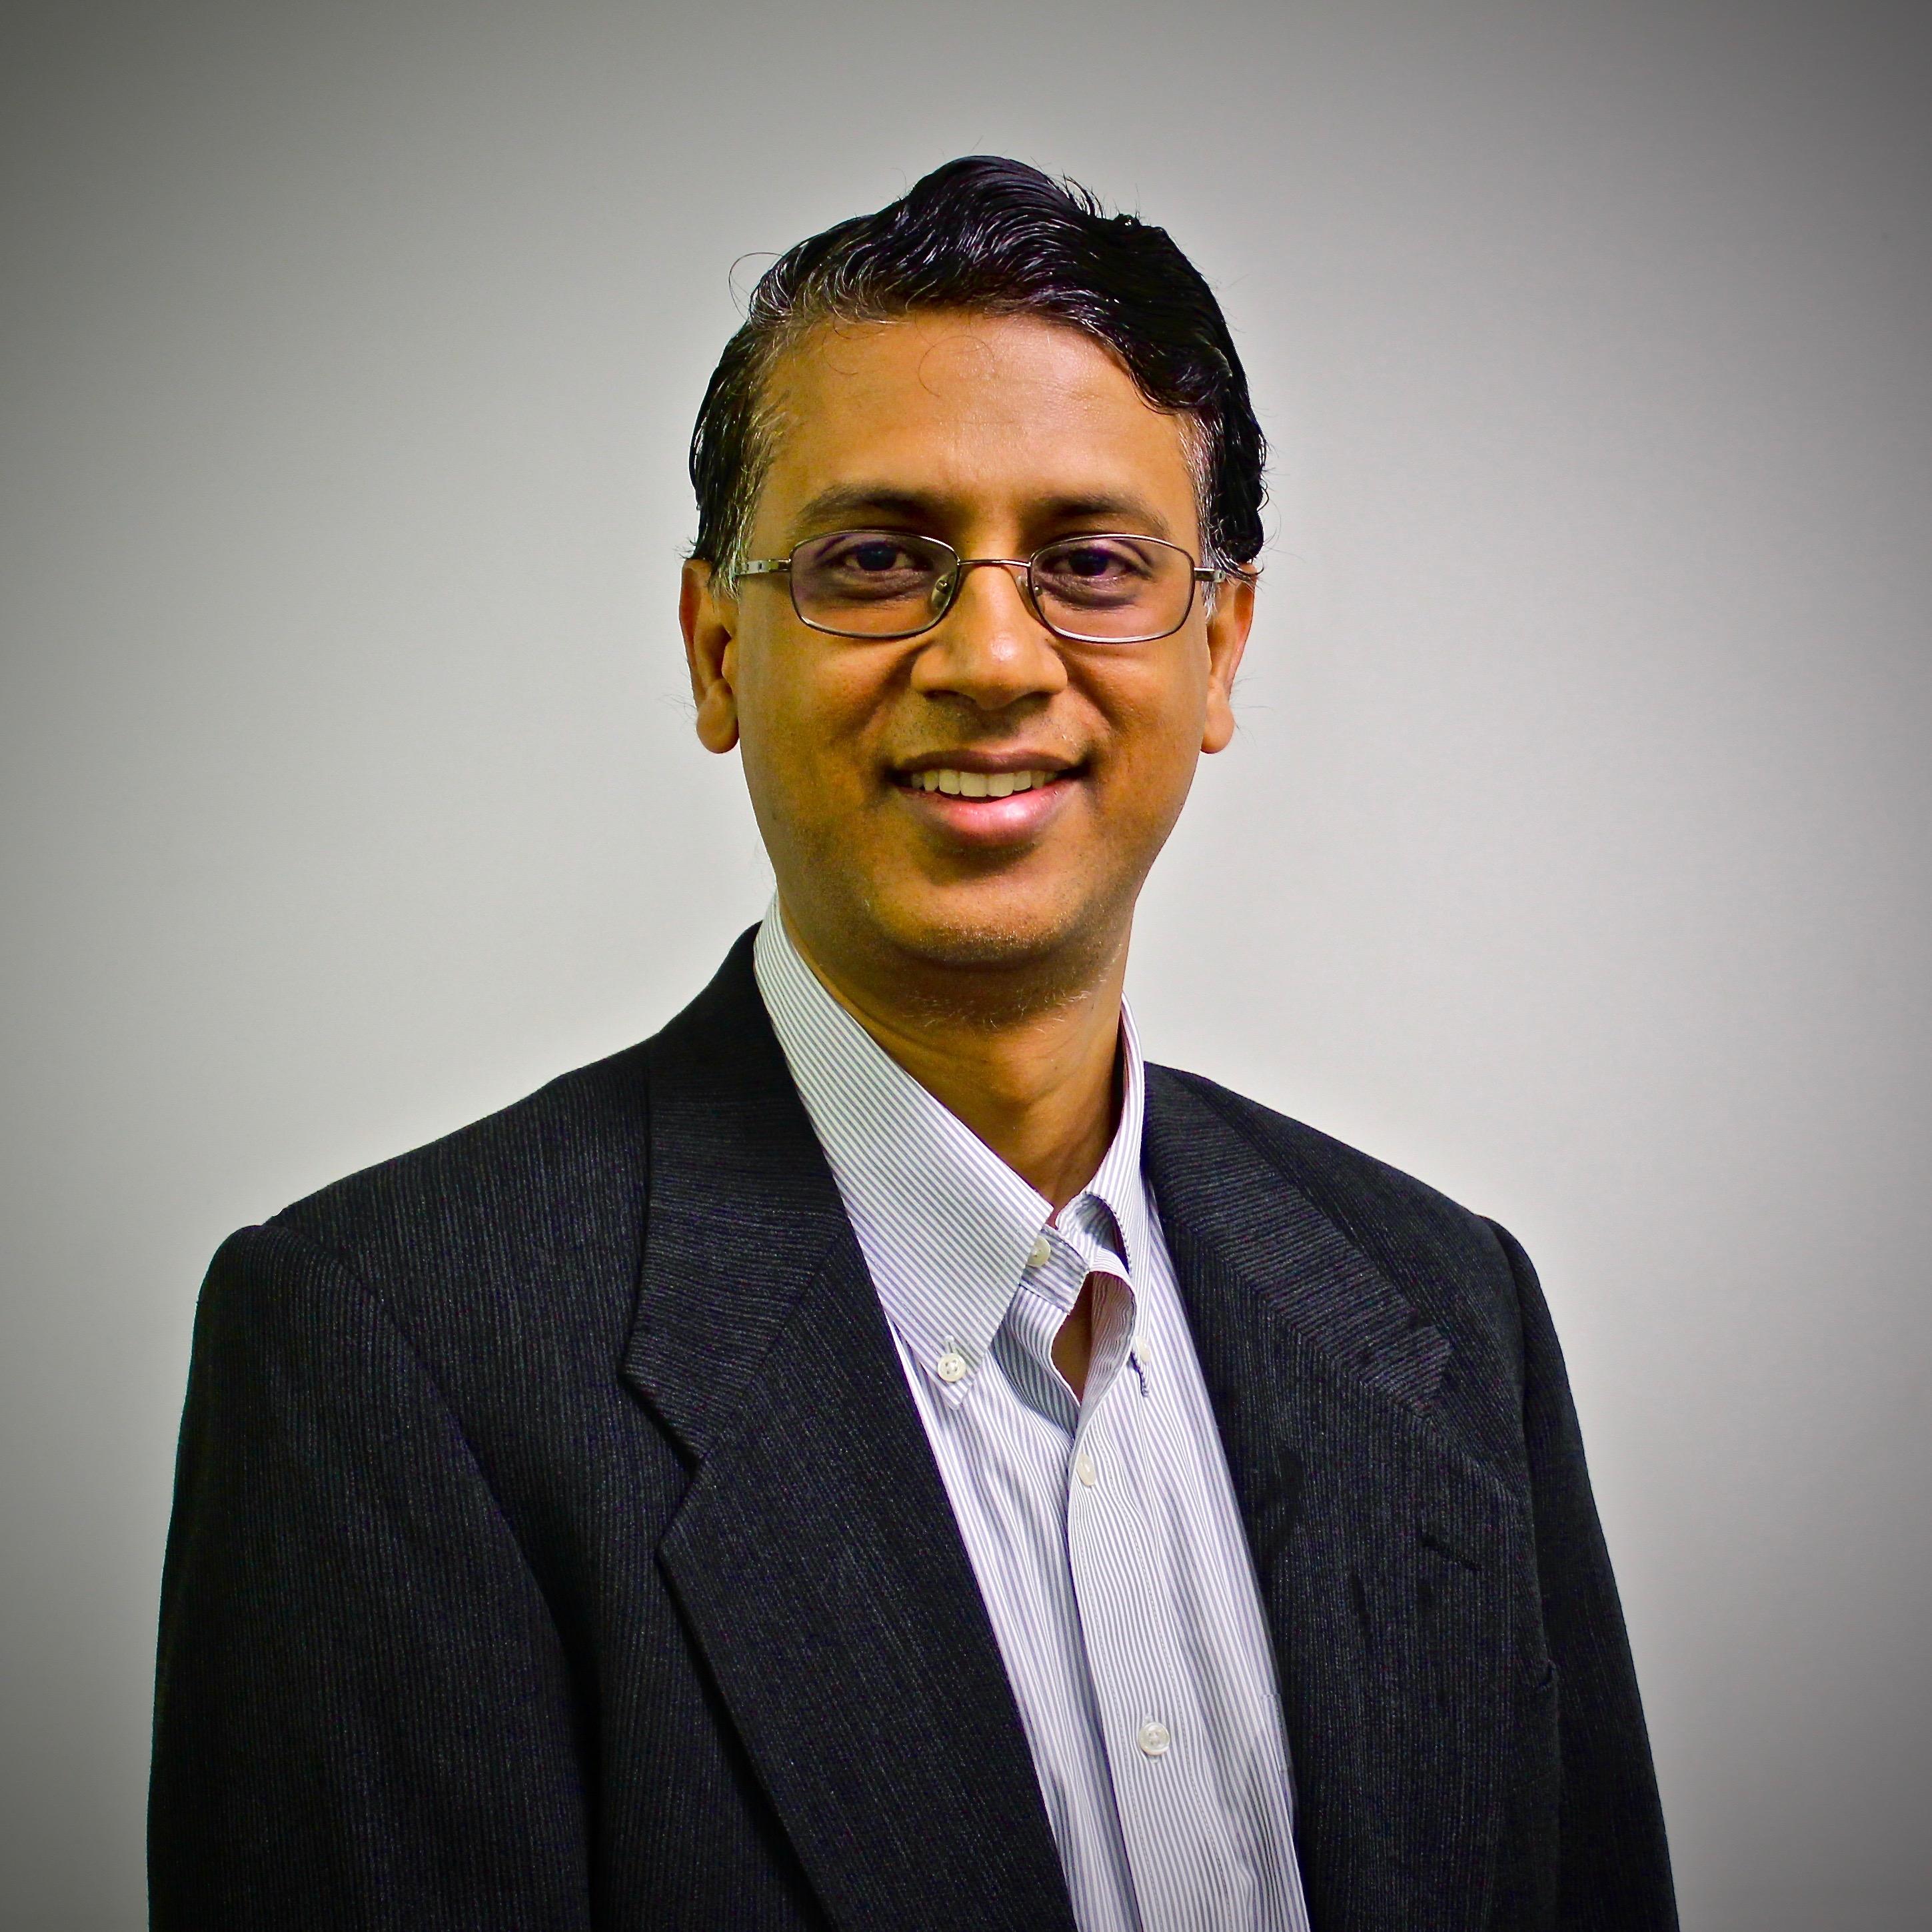 Rajeev Barua